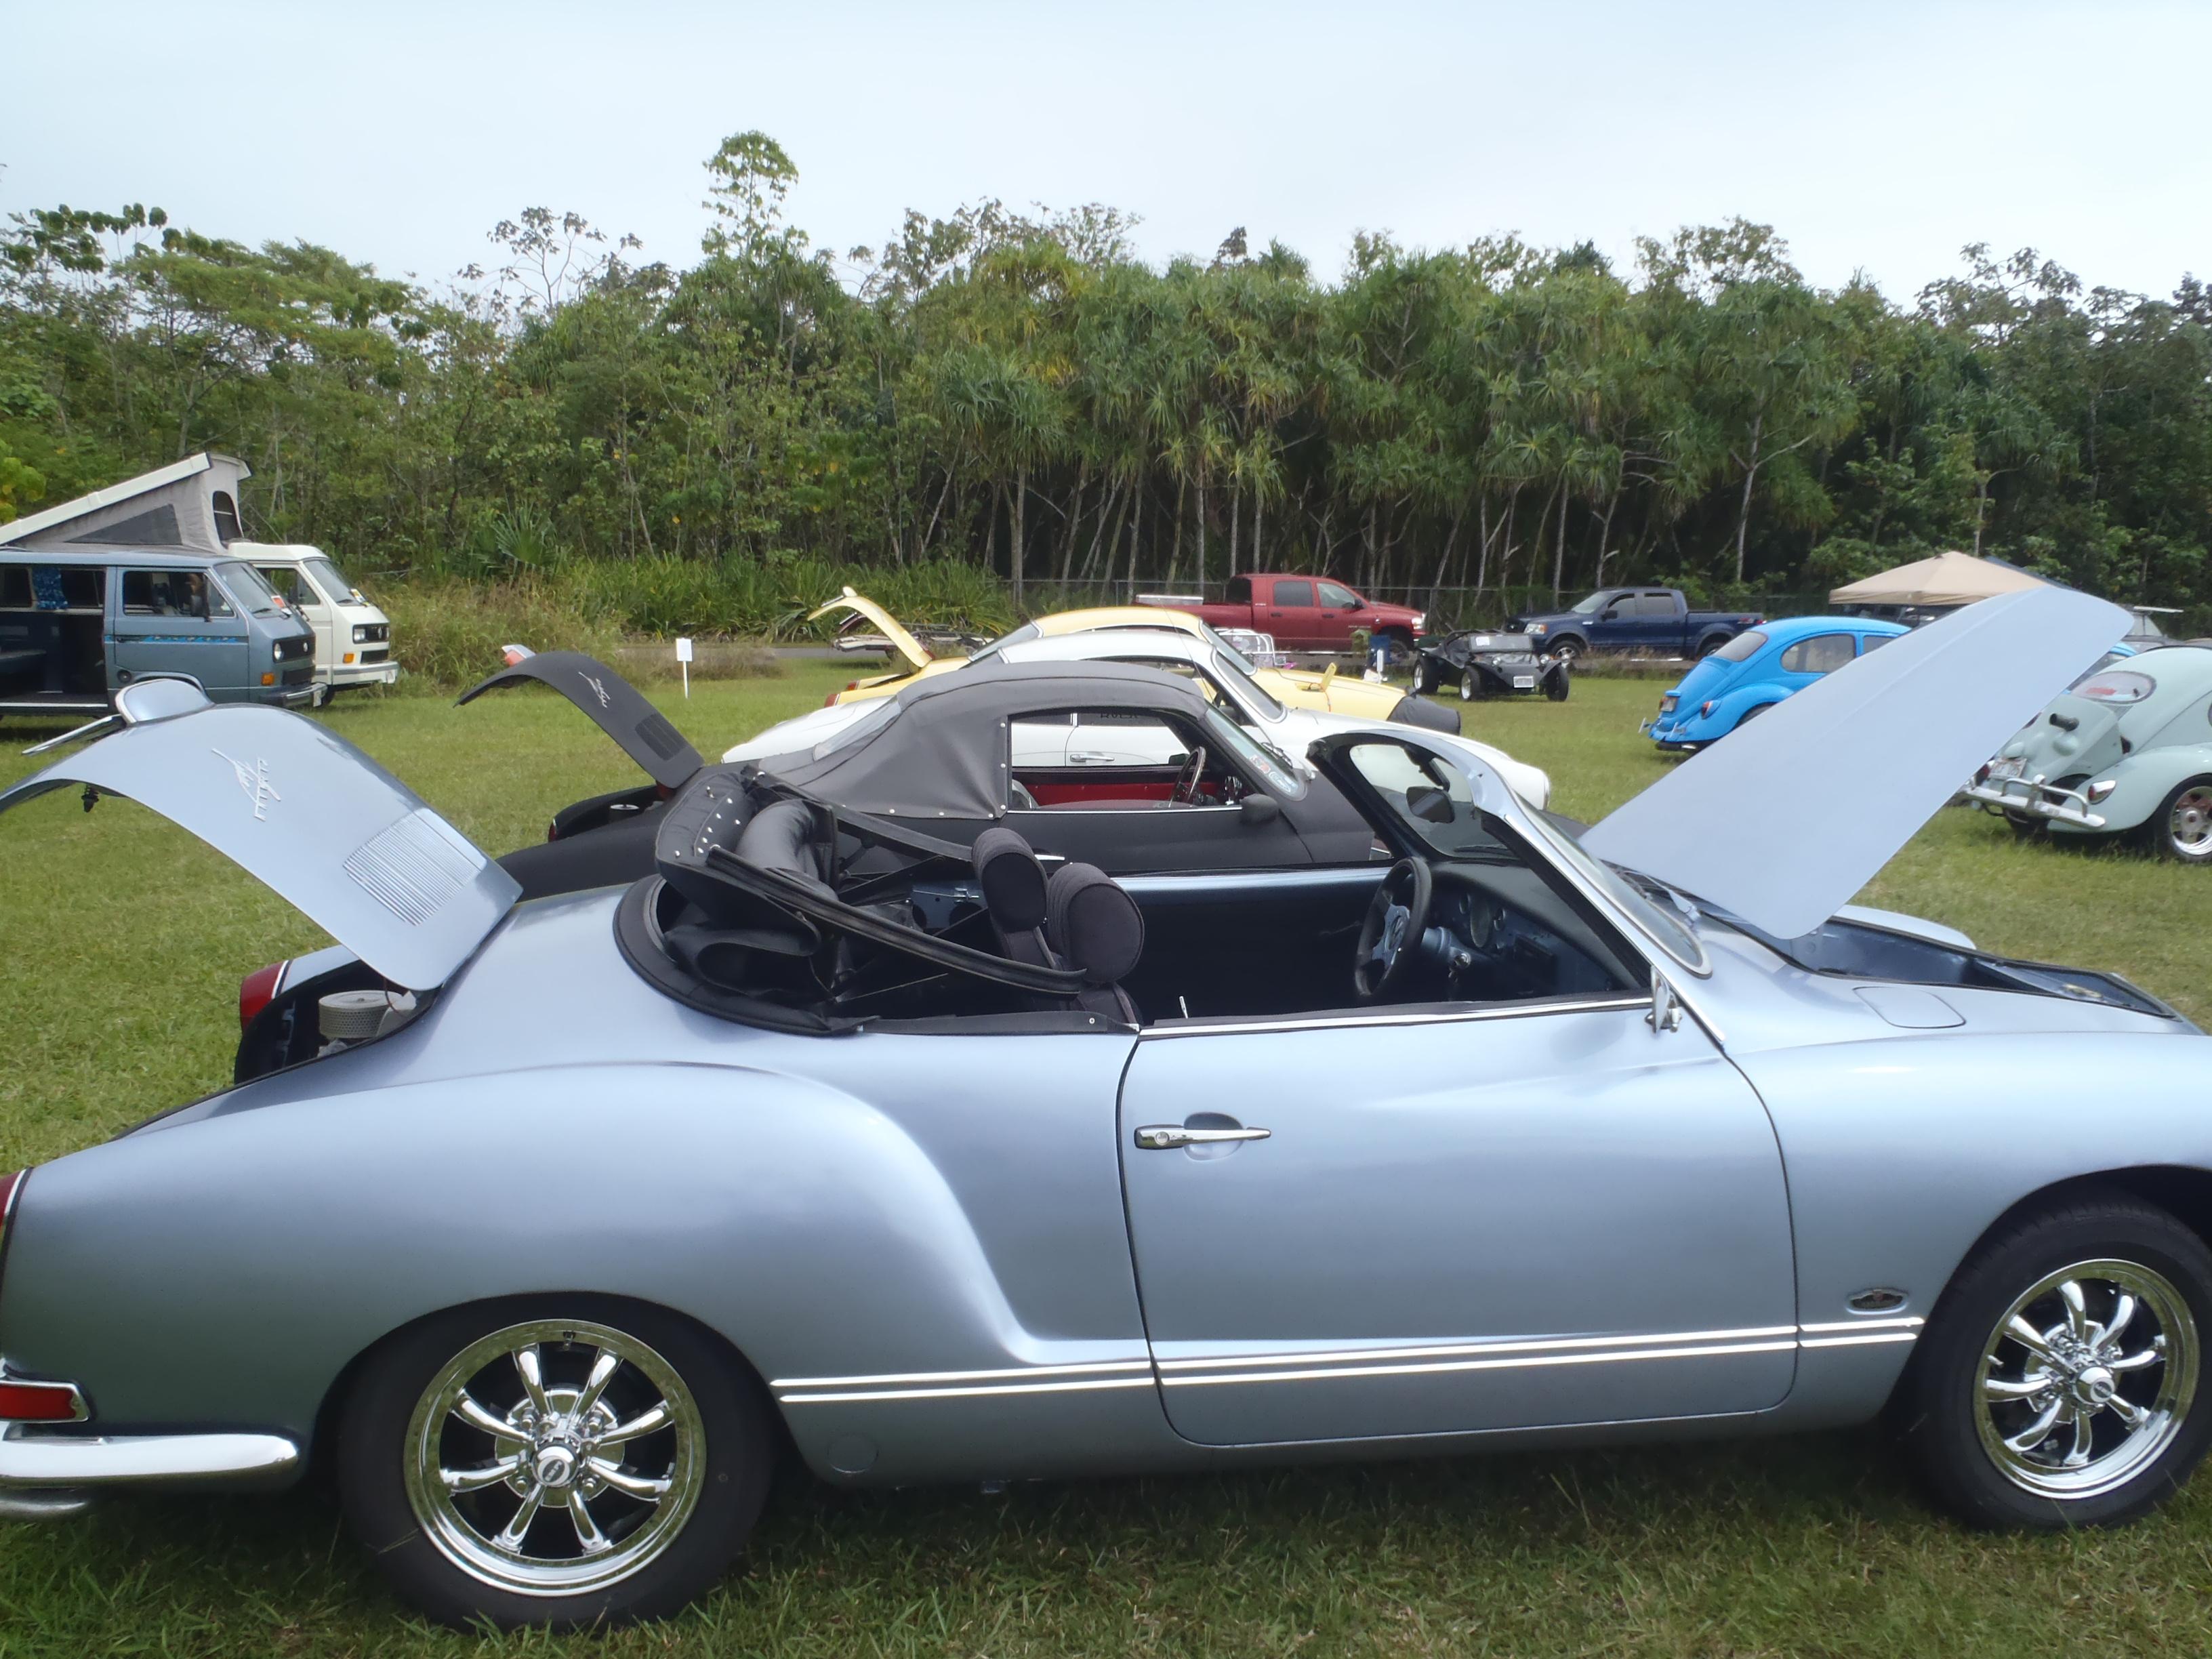 VW Bug-In 002.JPG